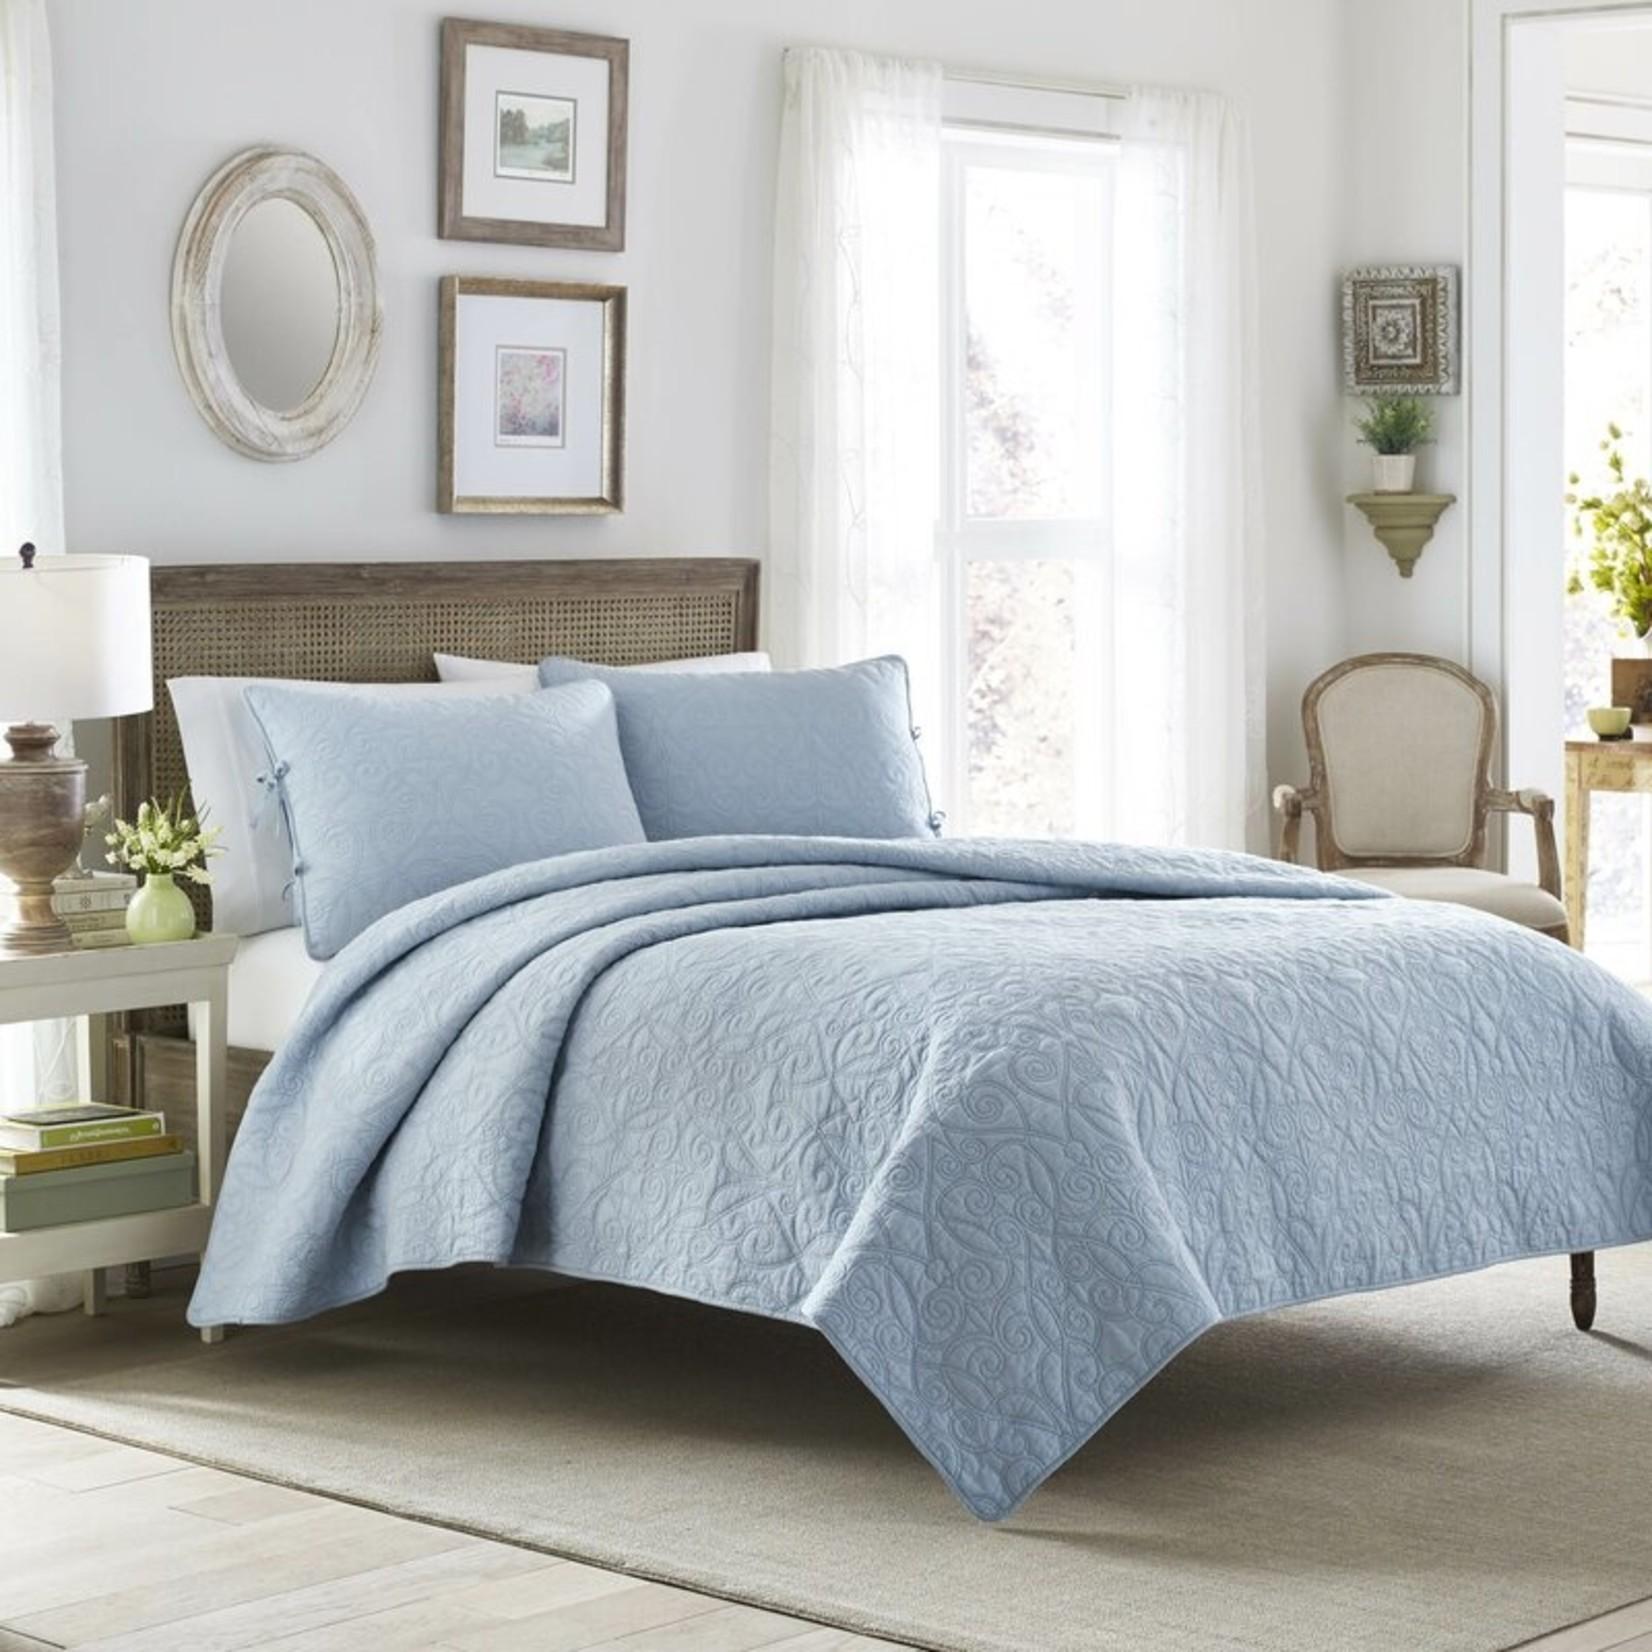 *Full/Queen - Felicity Reversible Quilt Set - Breeze Blue - Final Sale